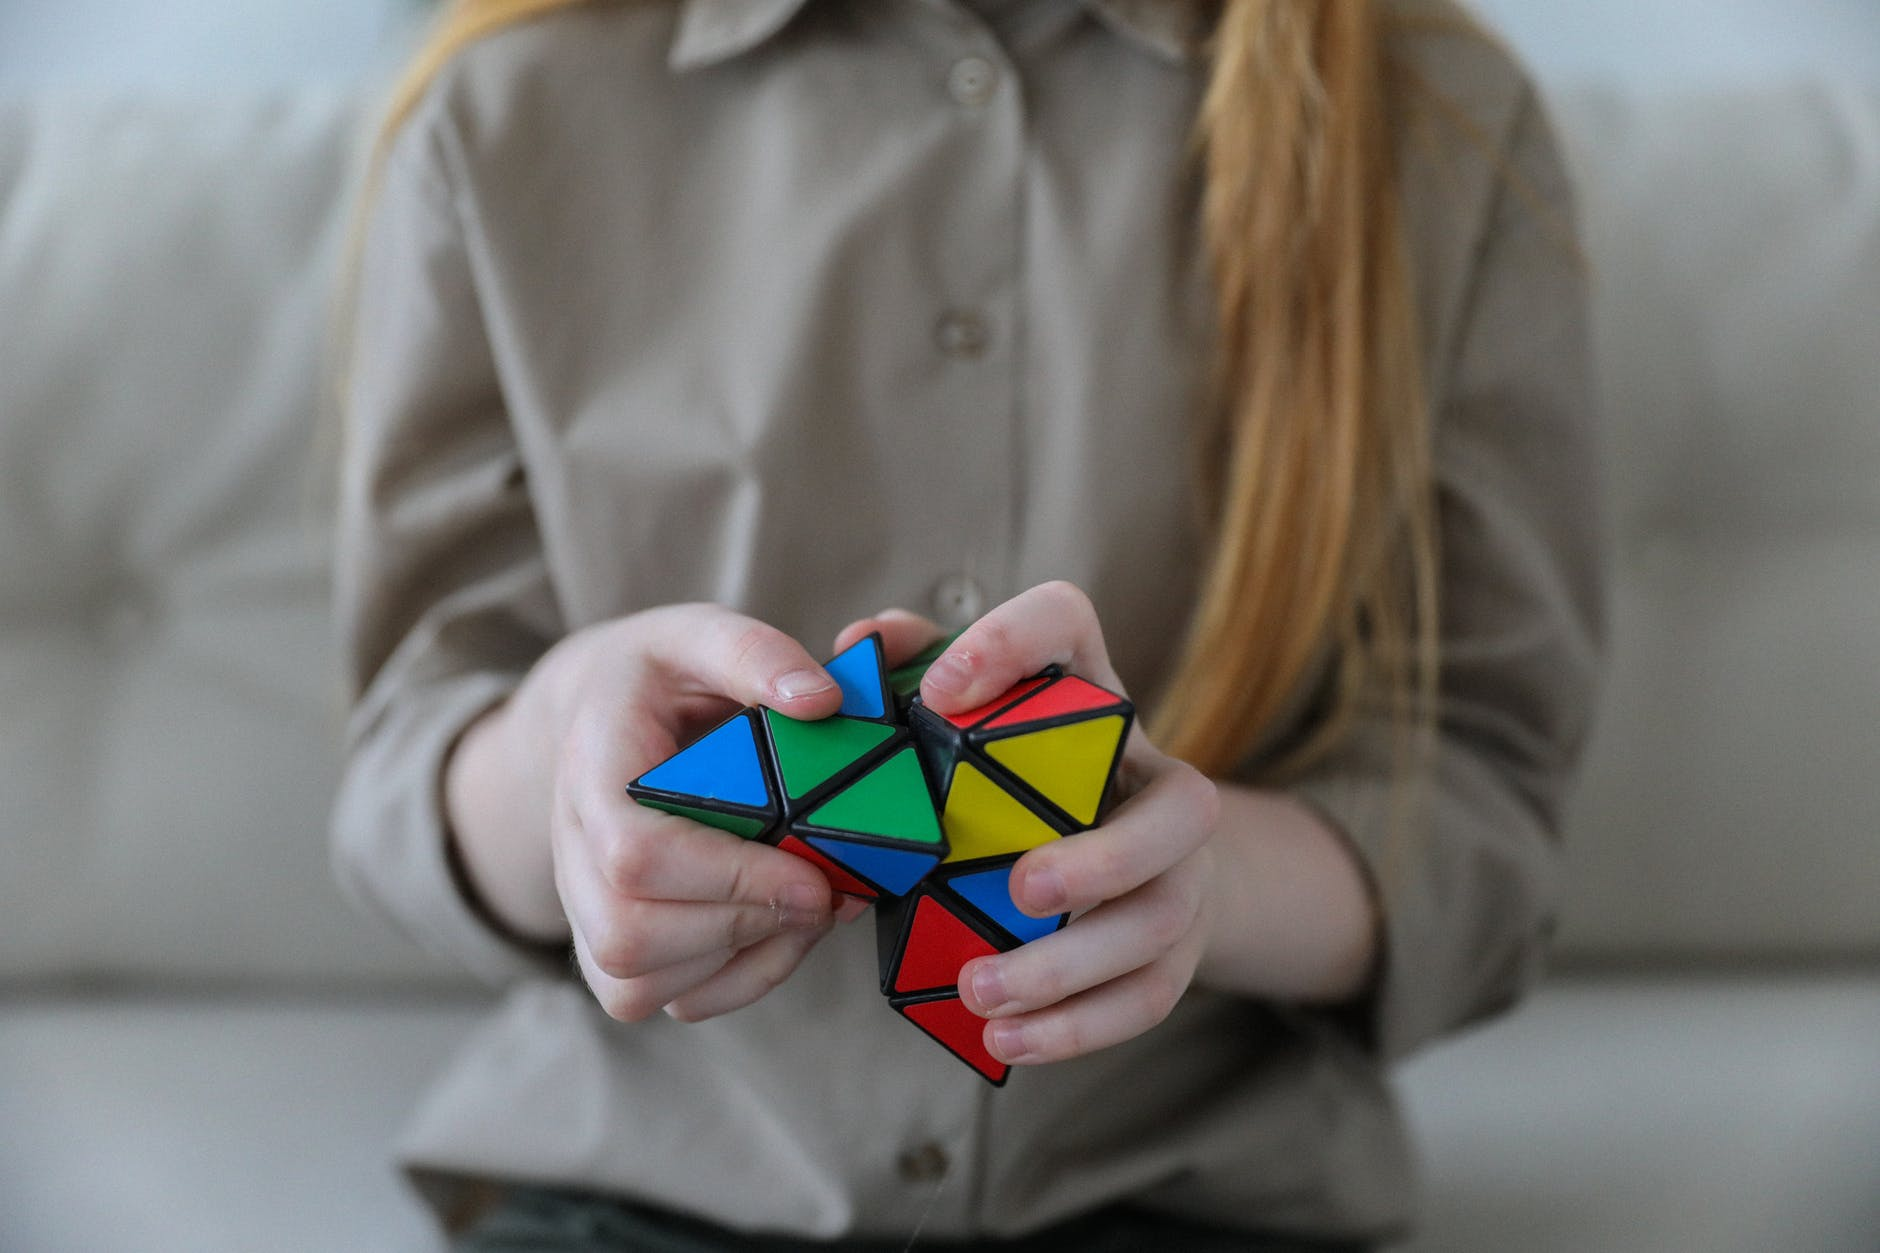 girl showing bright brainteaser in hands